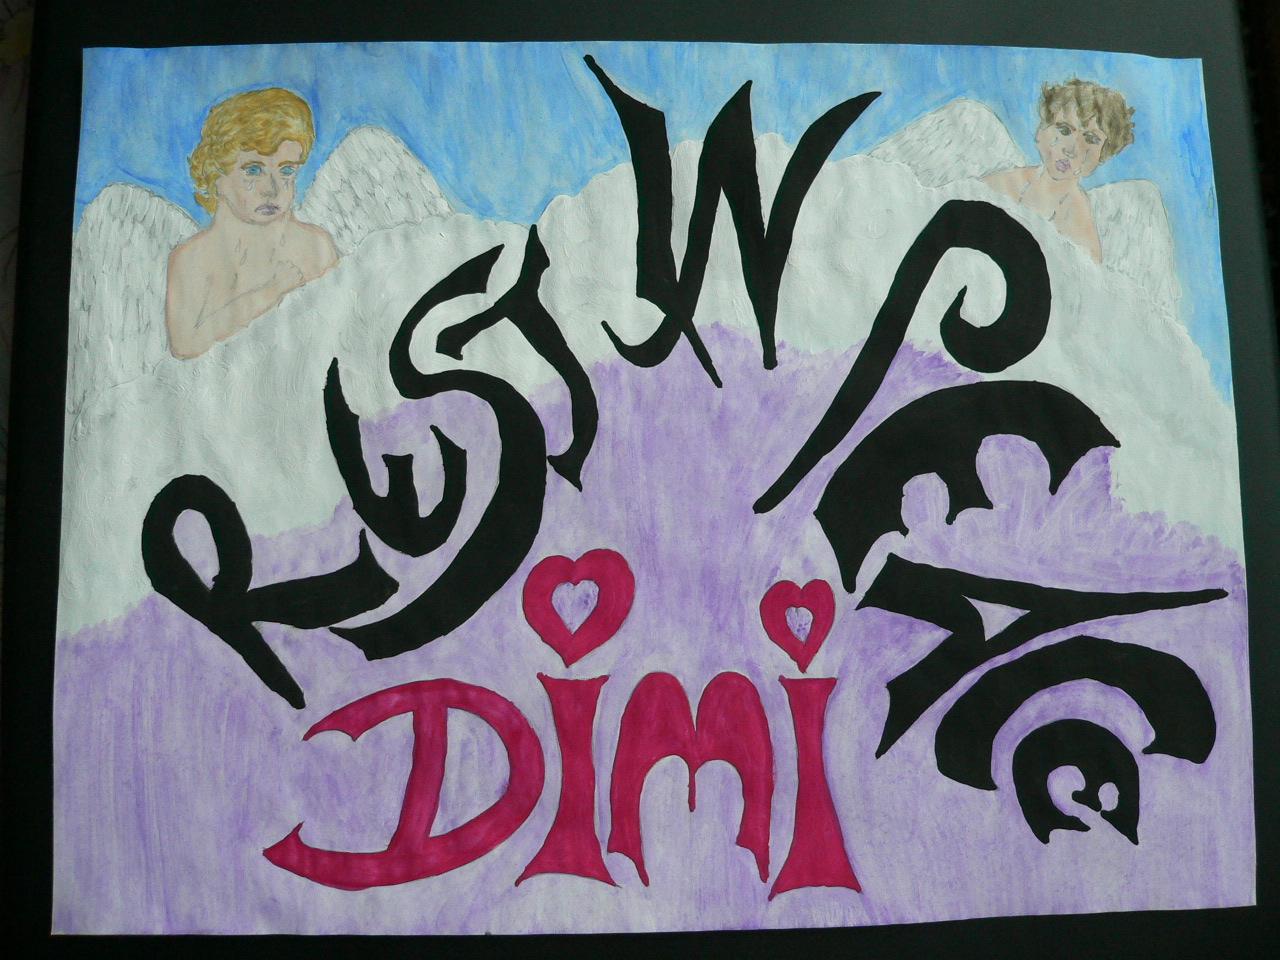 R.I.P.  Dimi by Dany-E